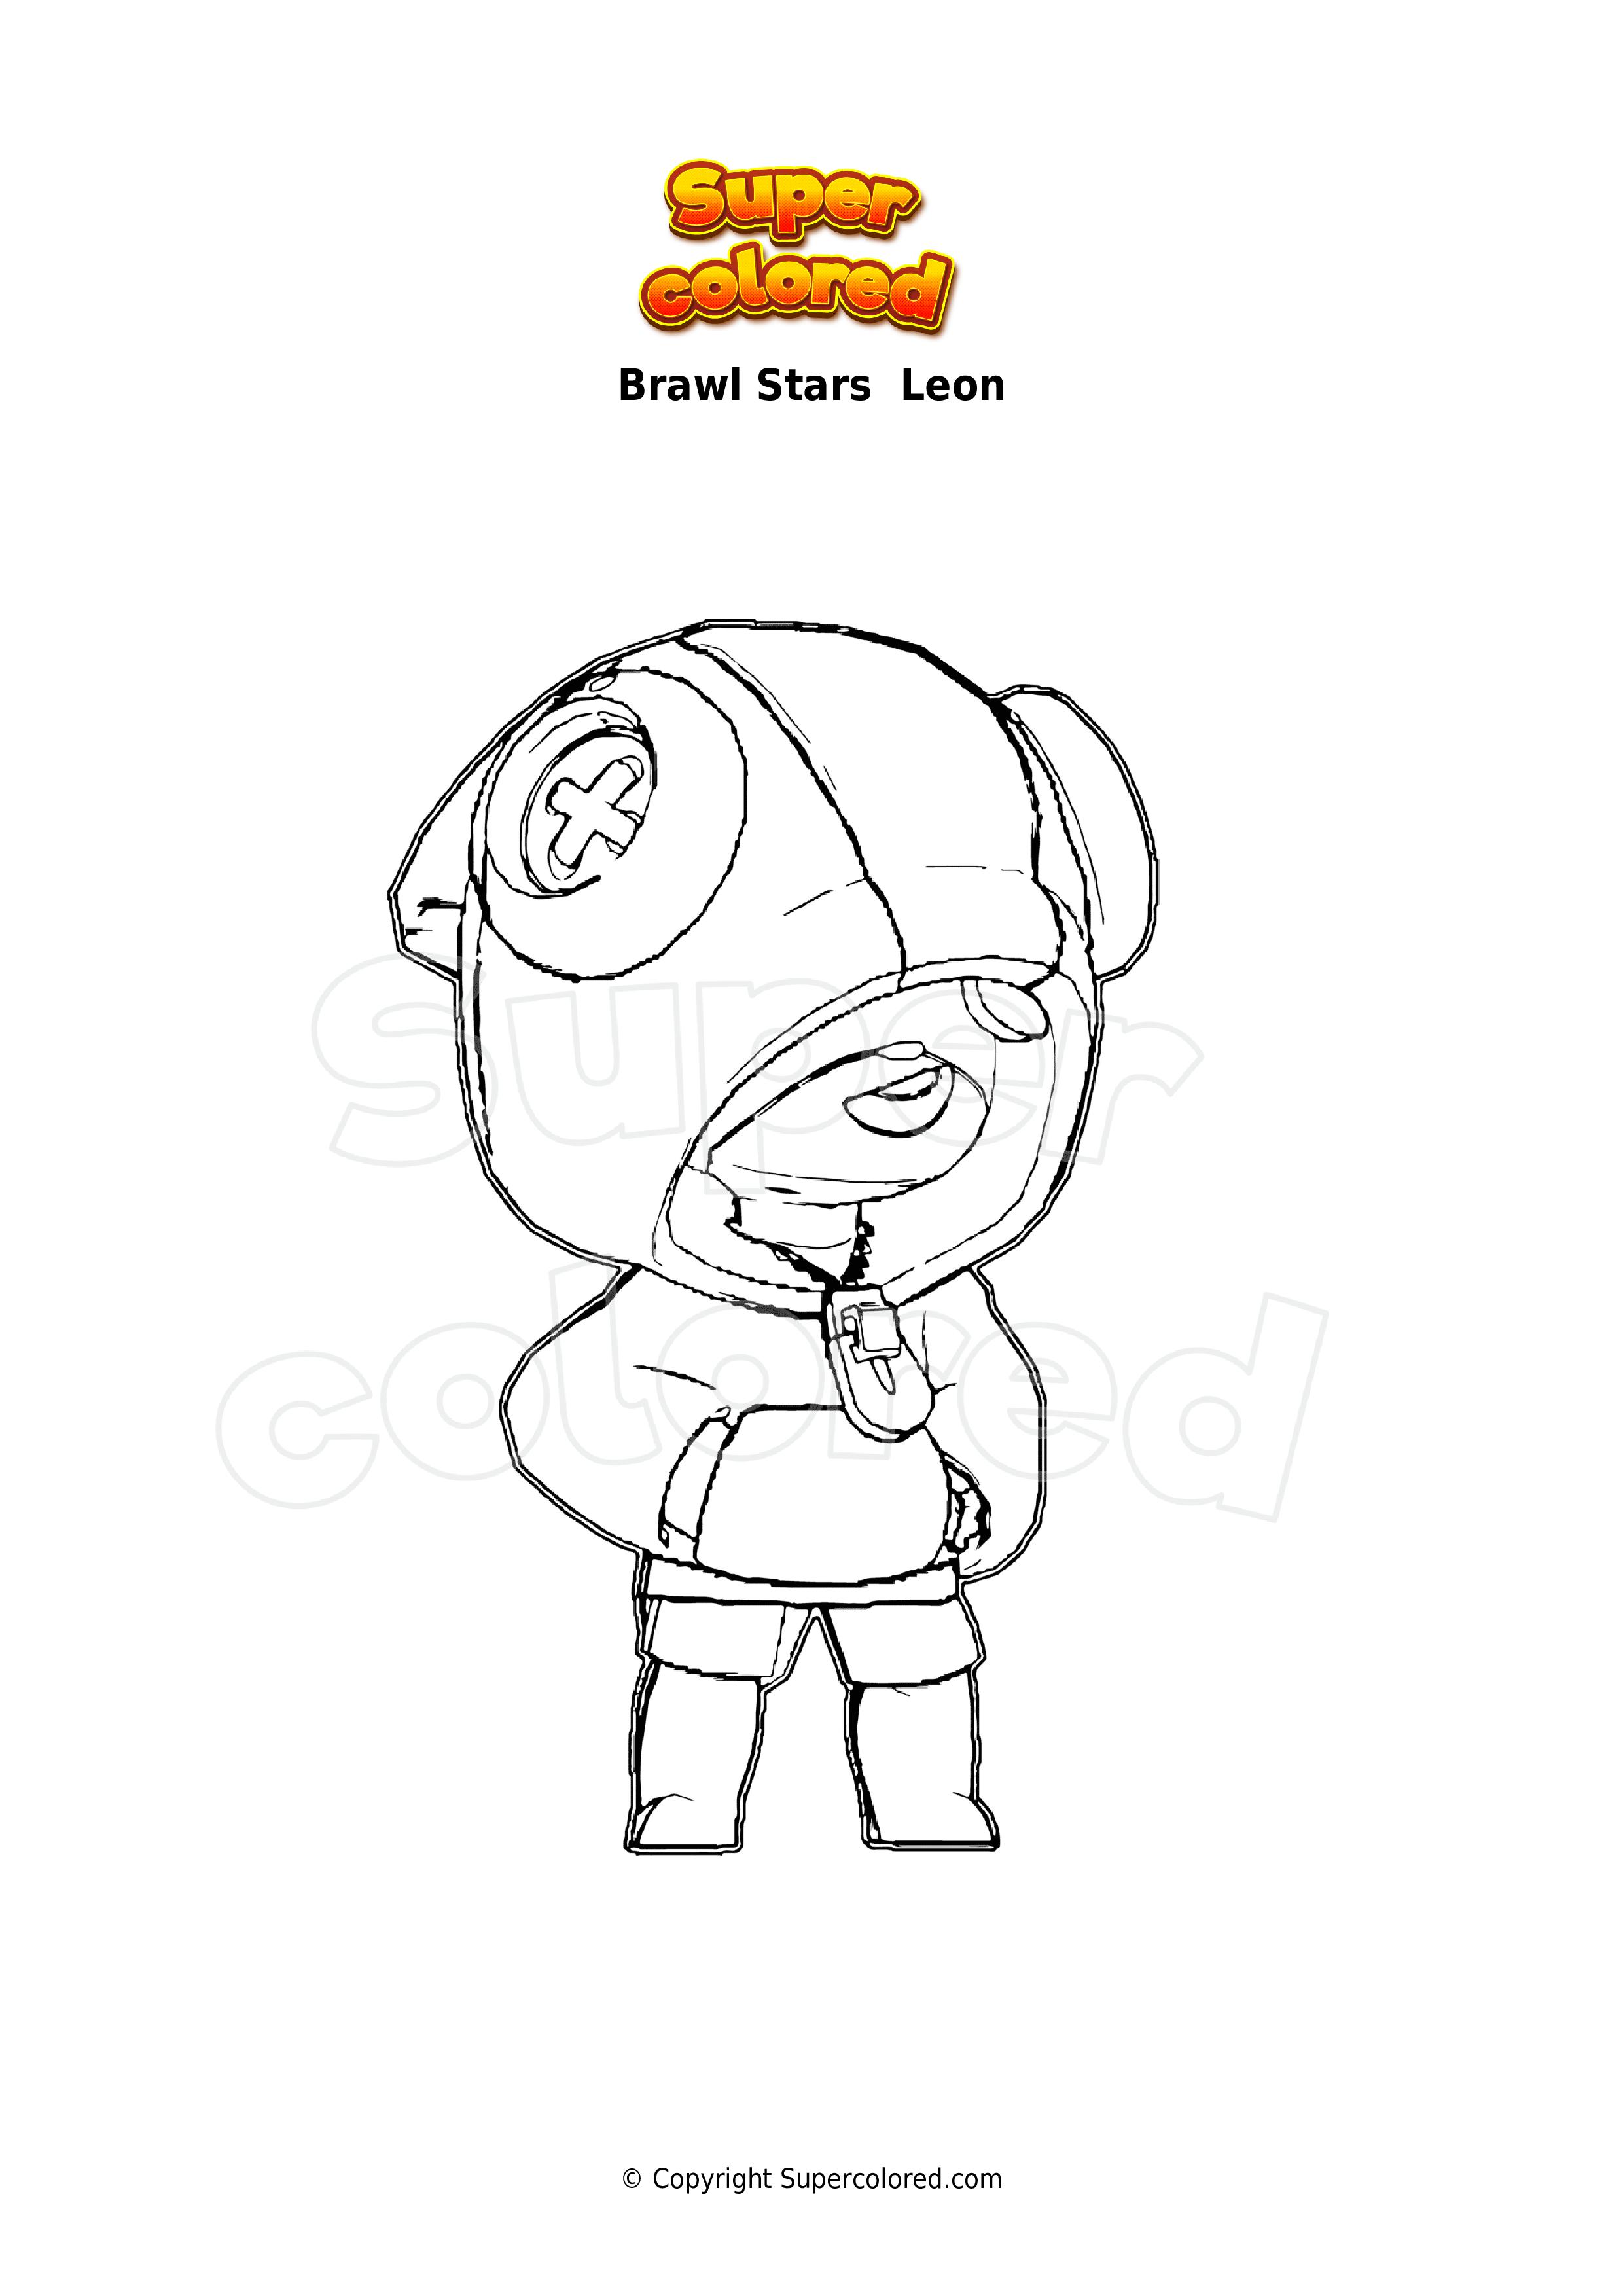 Ausmalbild Brawl Stars Leon - Supercolored.com